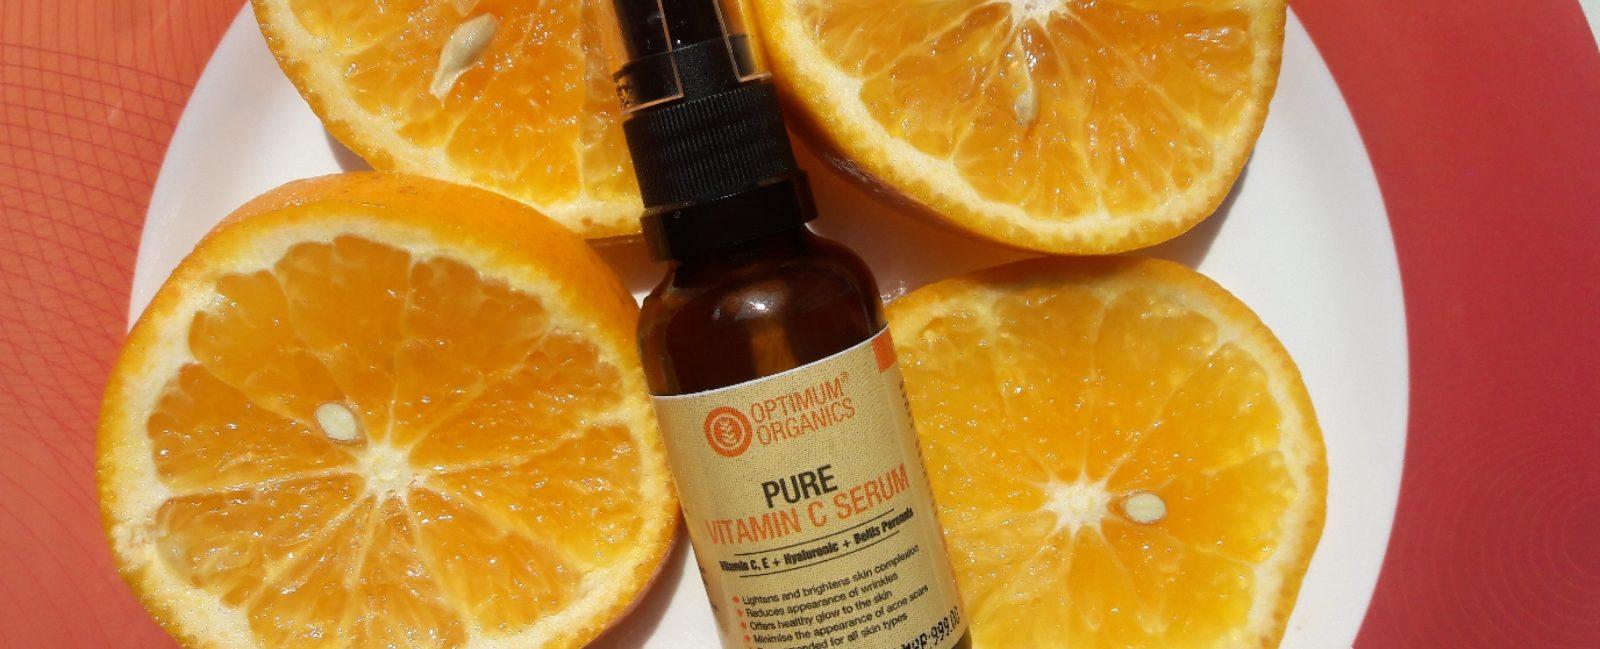 Optimum Organics Vitamin C Serum Review